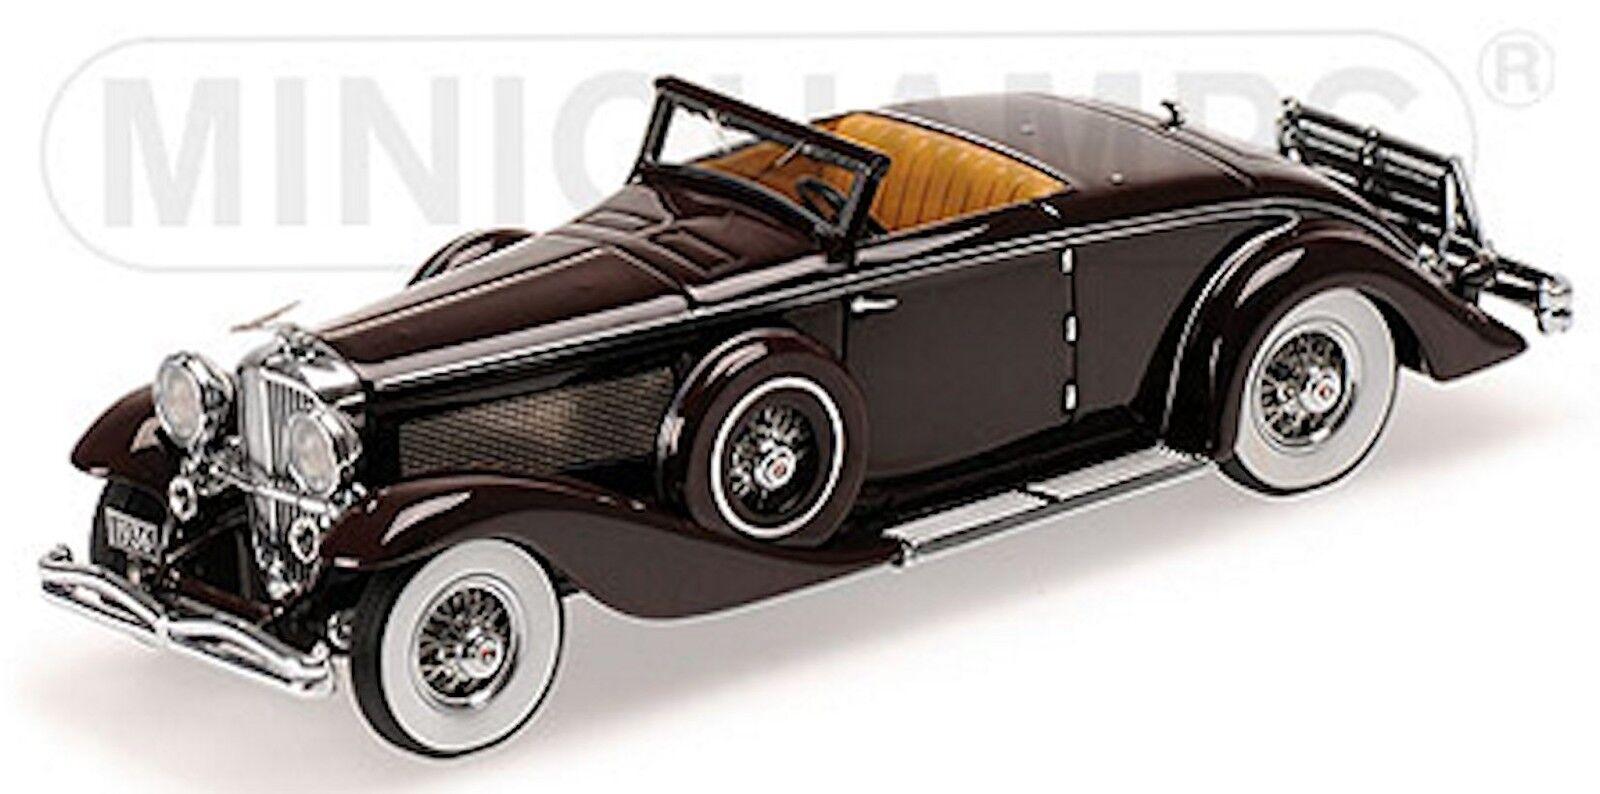 DUESENBERG sjn Convertible Coupe 1936 Dark-rouge First Class collection 1 43